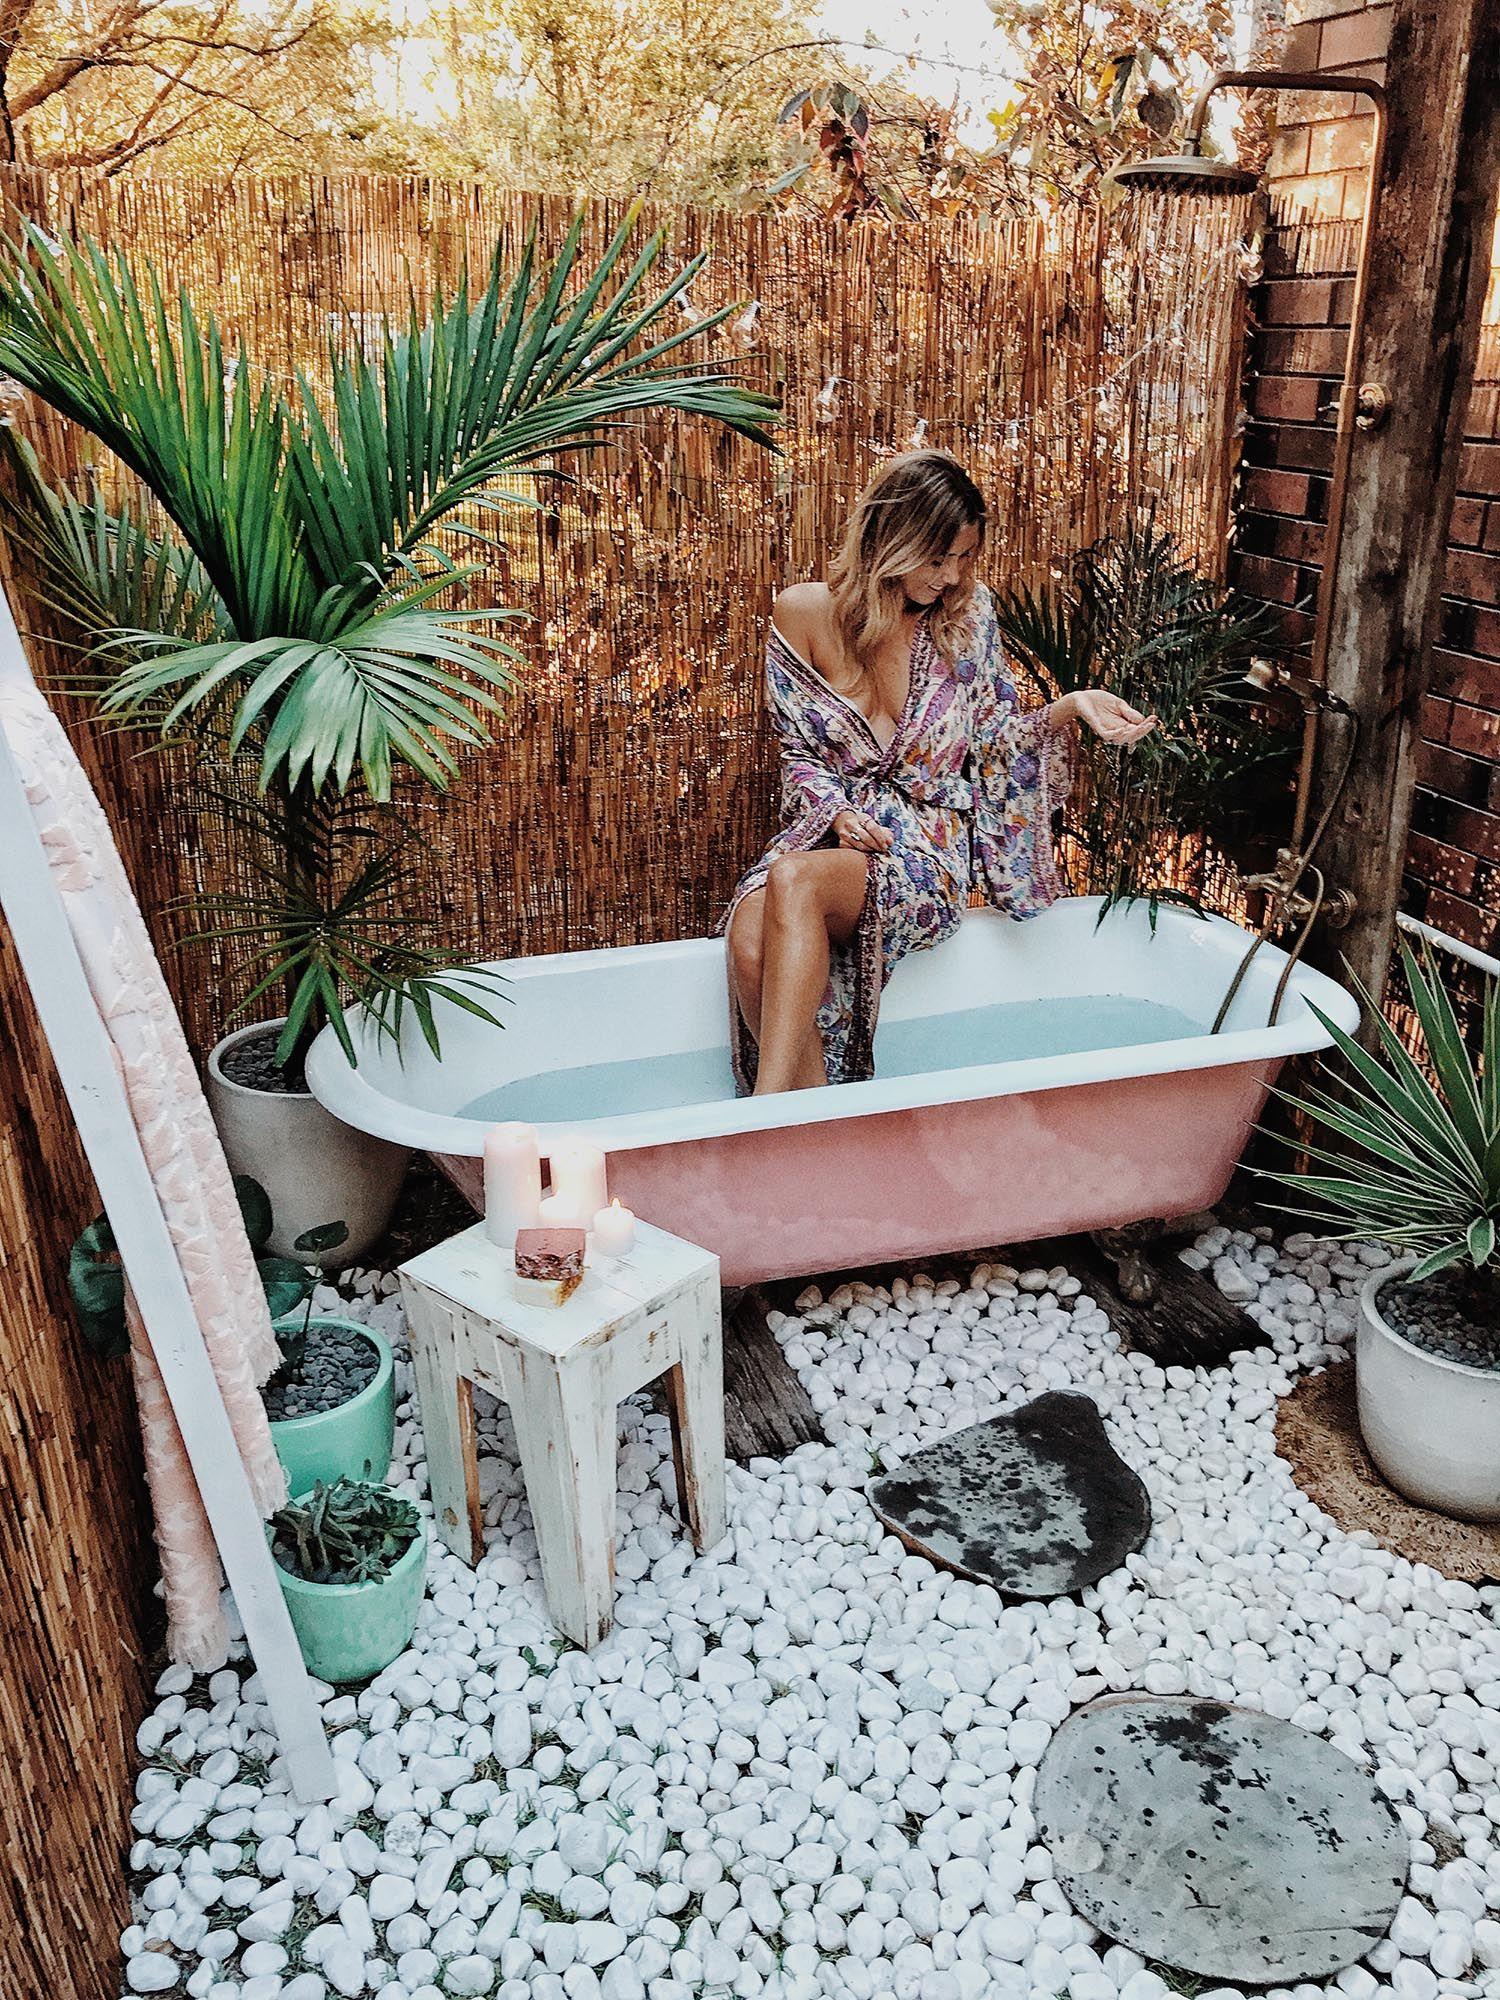 15 Fabulous Outdoor Shower Ideas Letting You Cherish A Comforting